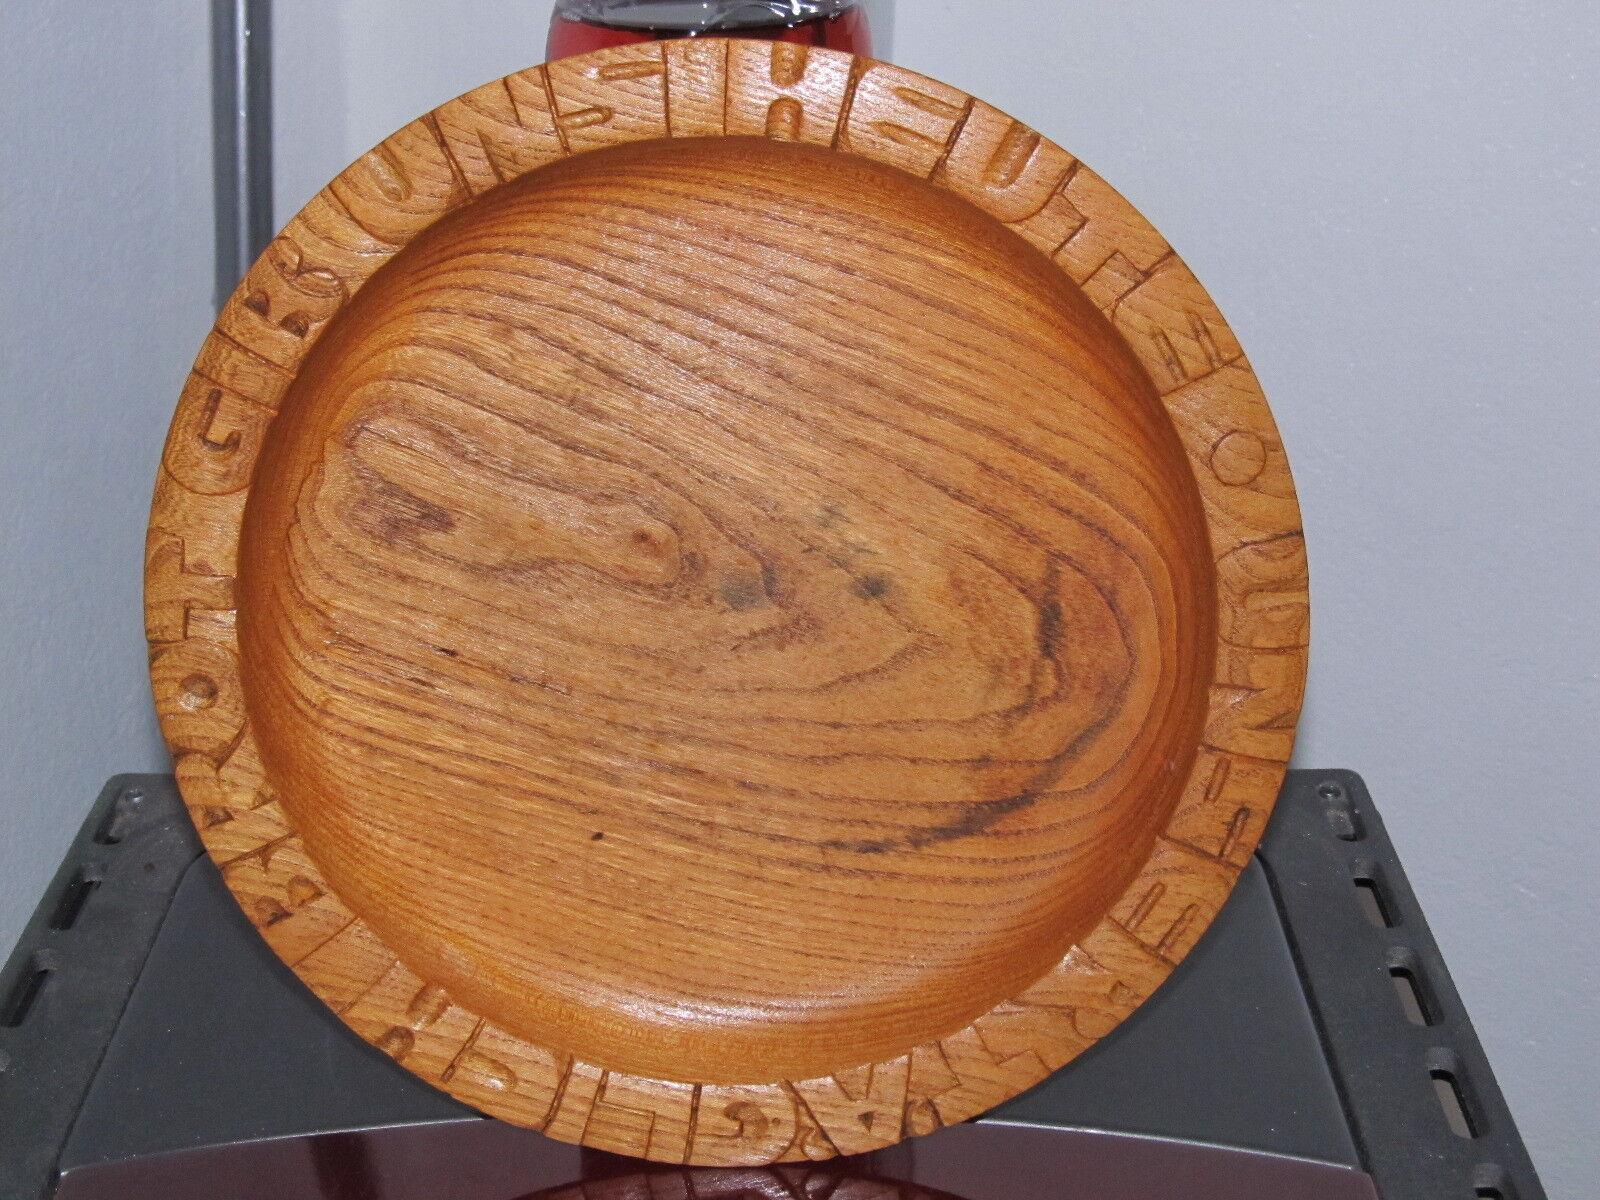 Holzteller Unser Täglich Brot Gib Uns Heute Handarbeit Alt Kirche Landhausstil